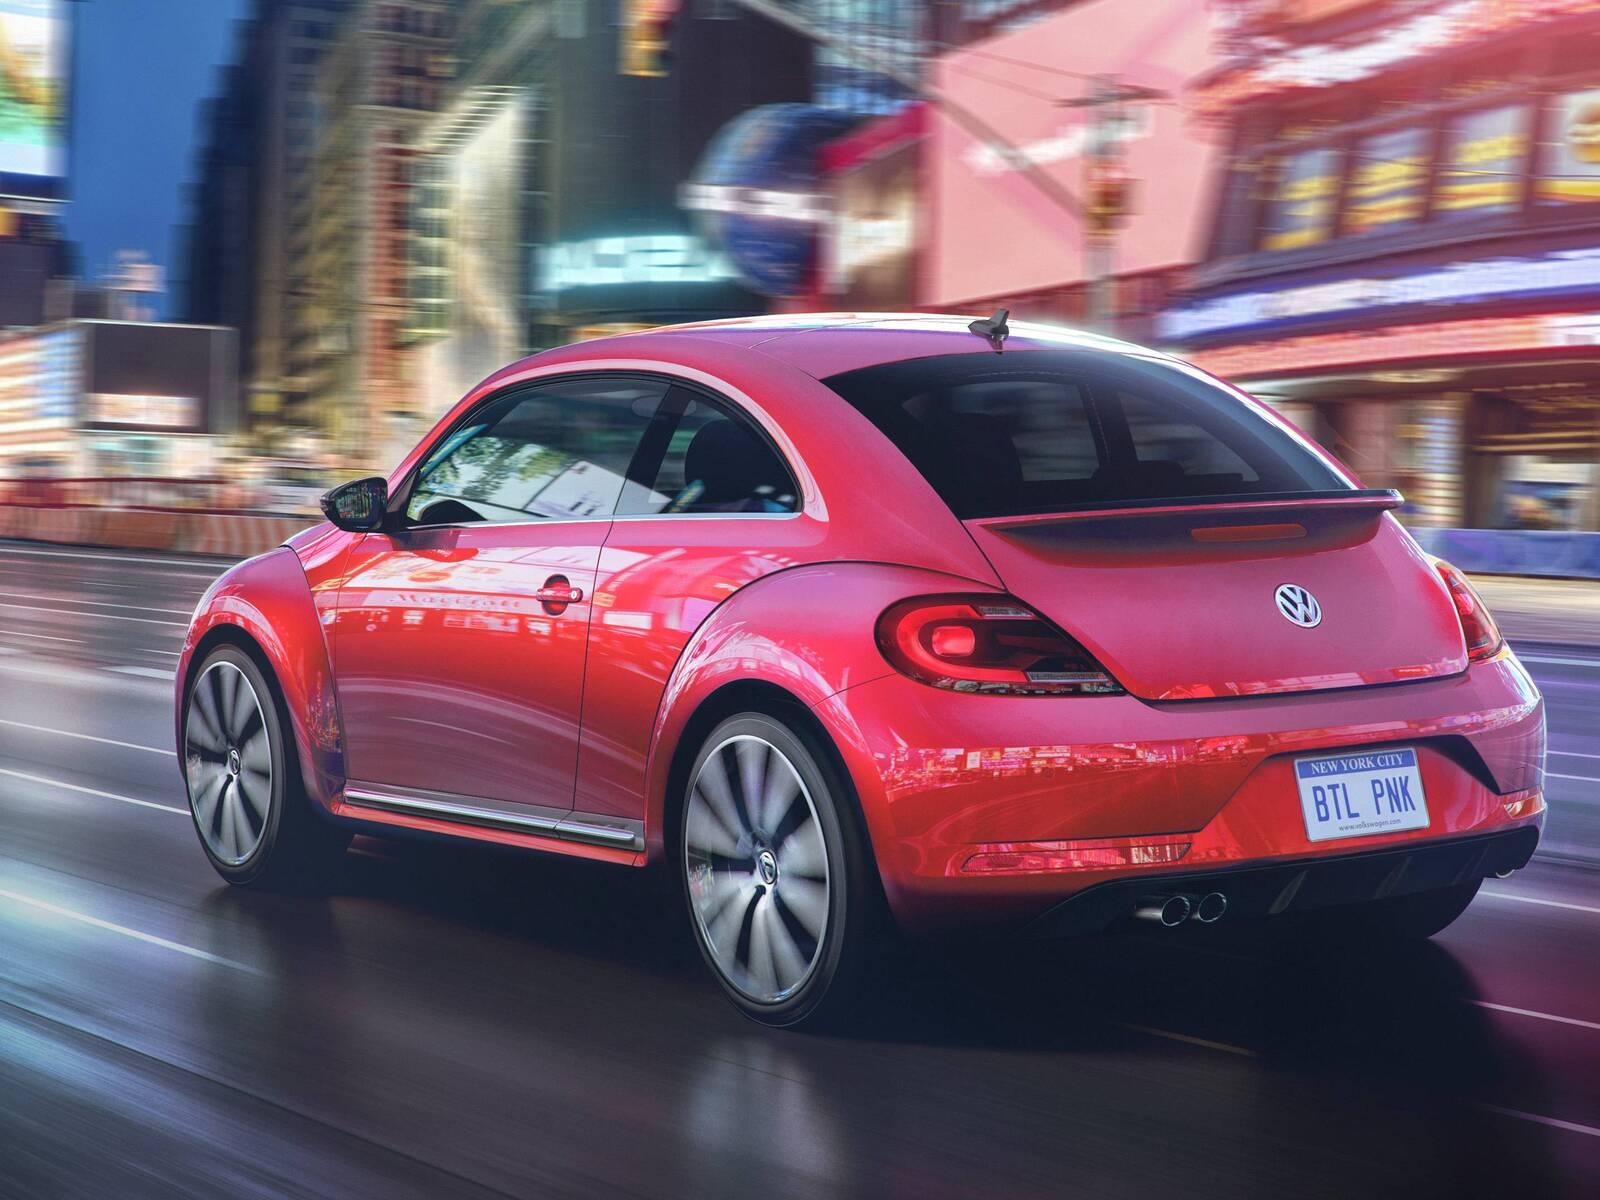 2017-volkswagen-pink-beetle-model-qhd.jpg